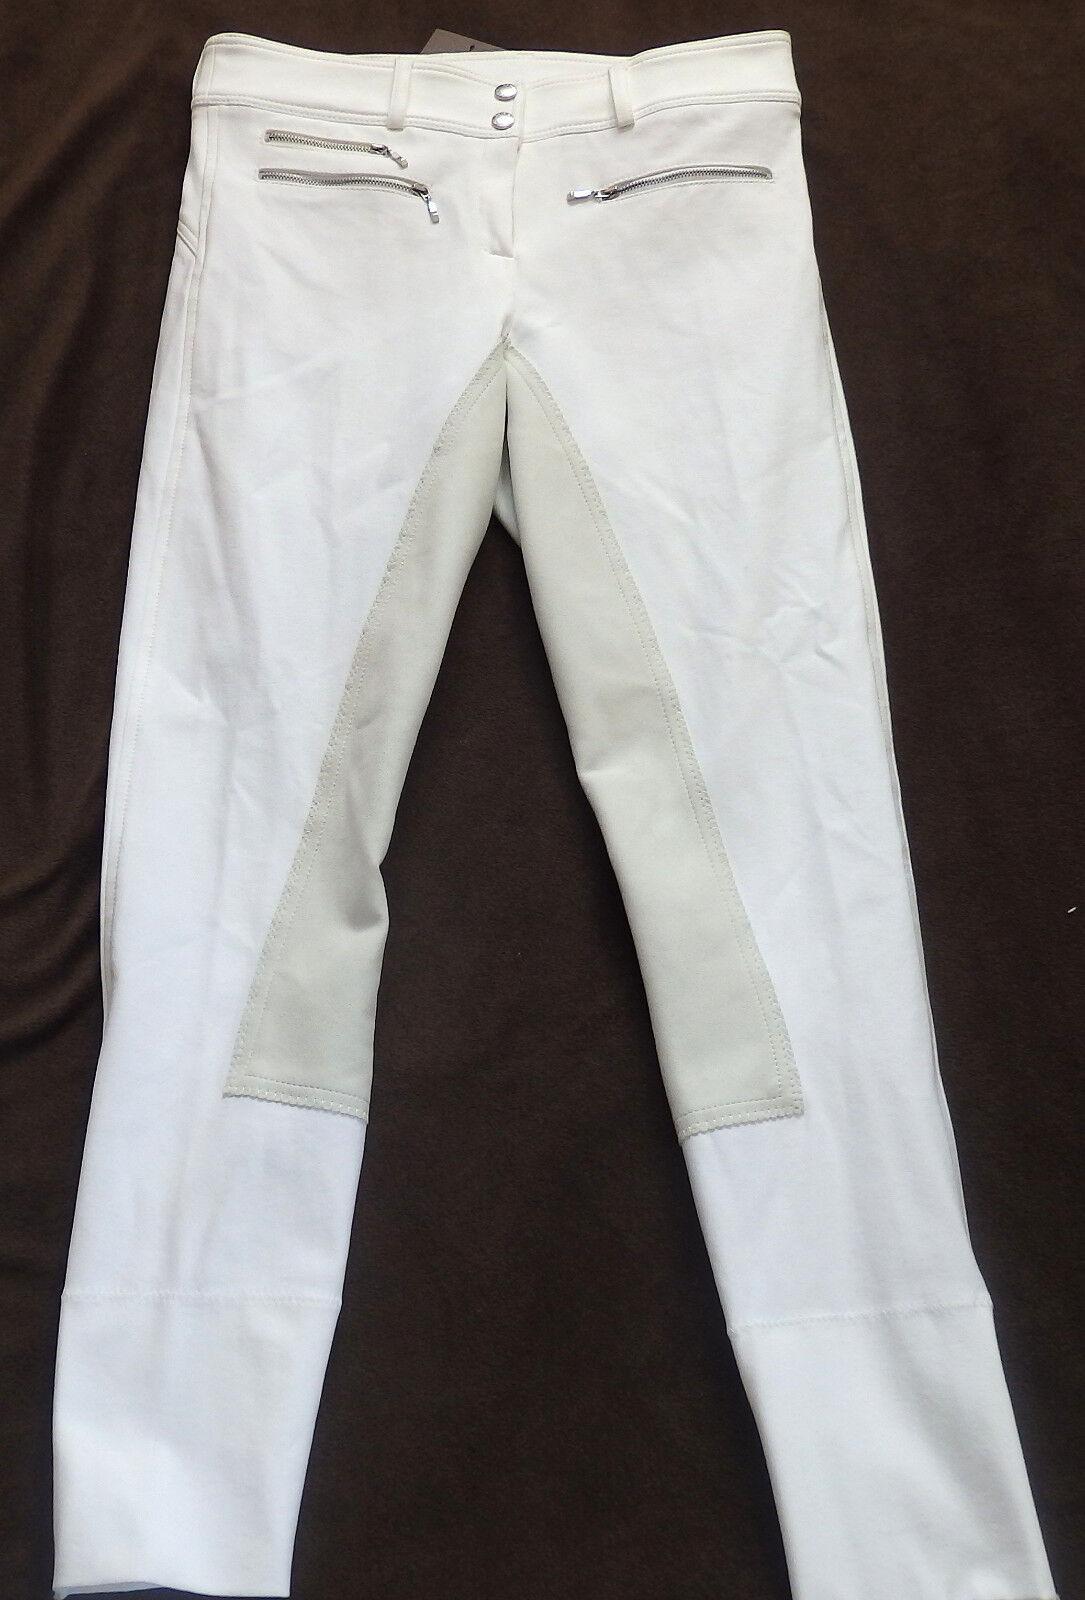 Cavallo montar, ribete  de pleno, blancoo, talla 42, Candy (1085)  venta con descuento